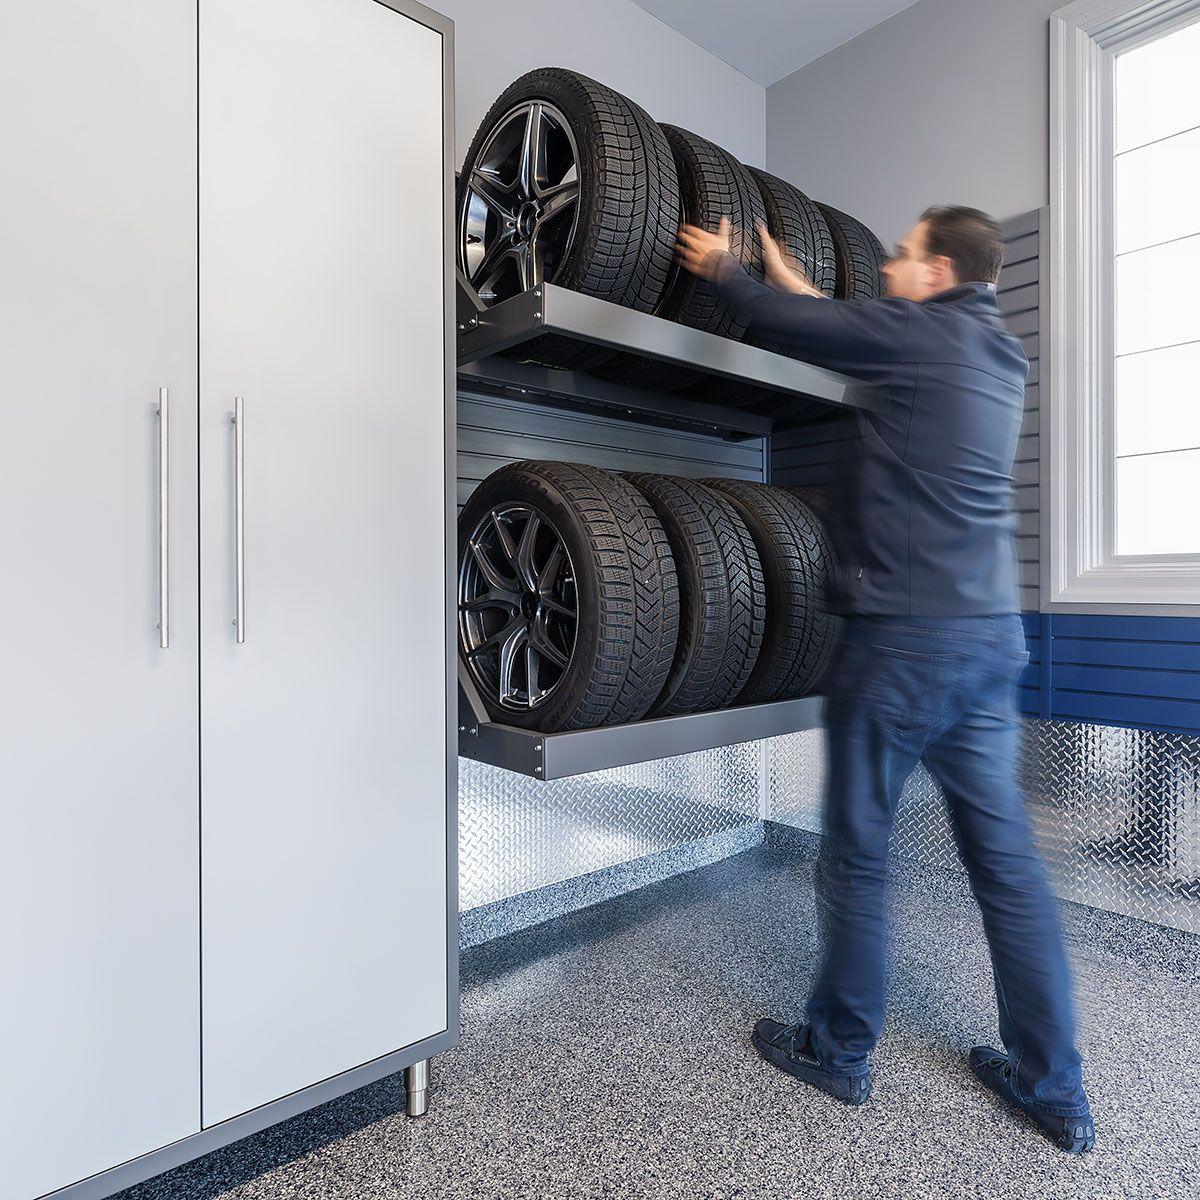 Two Tire Racks Holding 8 Tires Tire Rack Garage Organisation Tire Storage